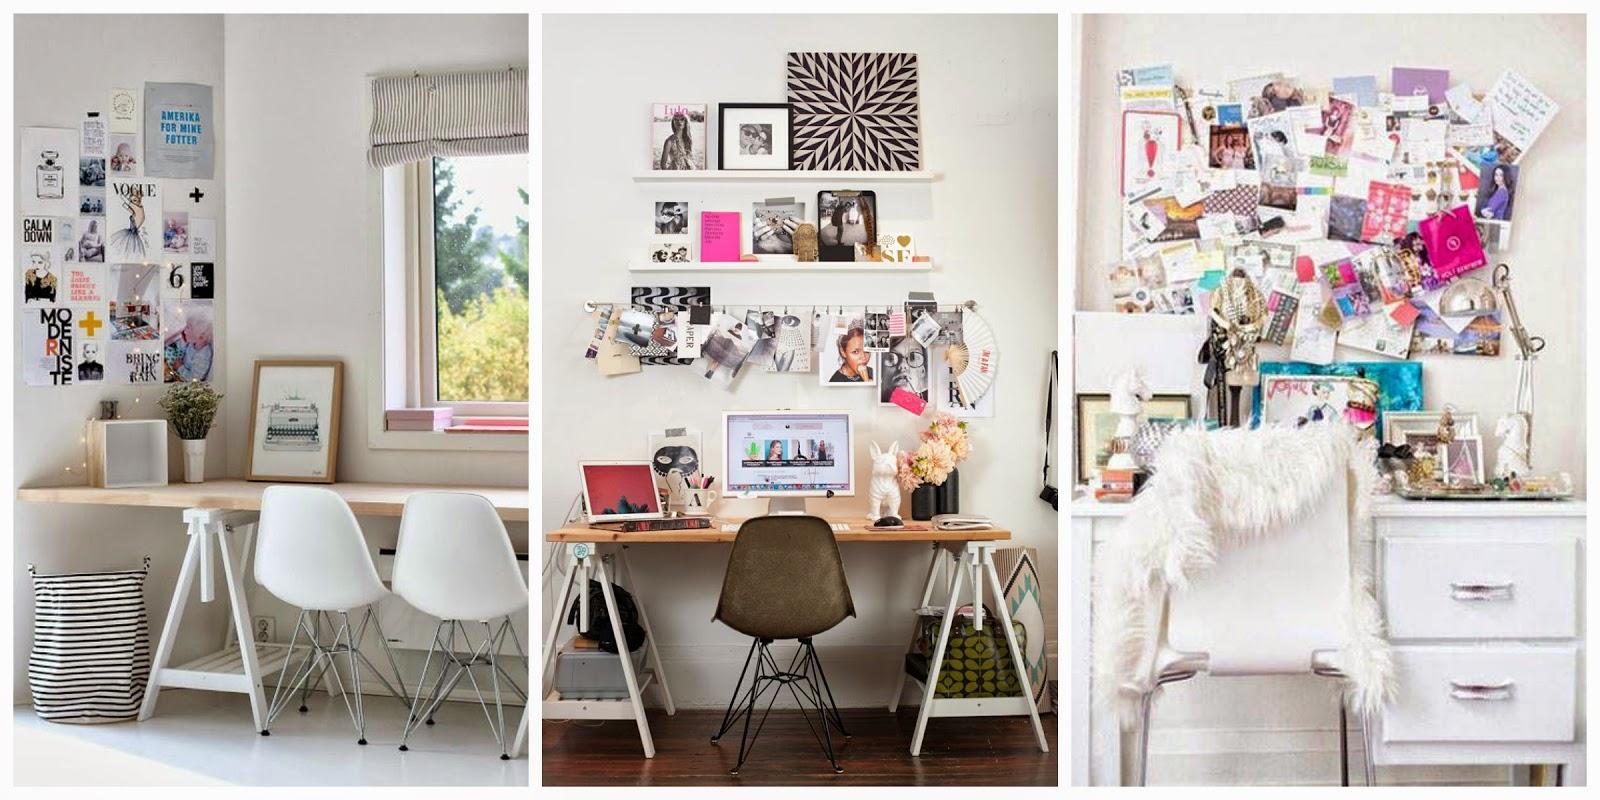 Femmelien 5 x bureau decoratie - Decoratie bureau travail ...